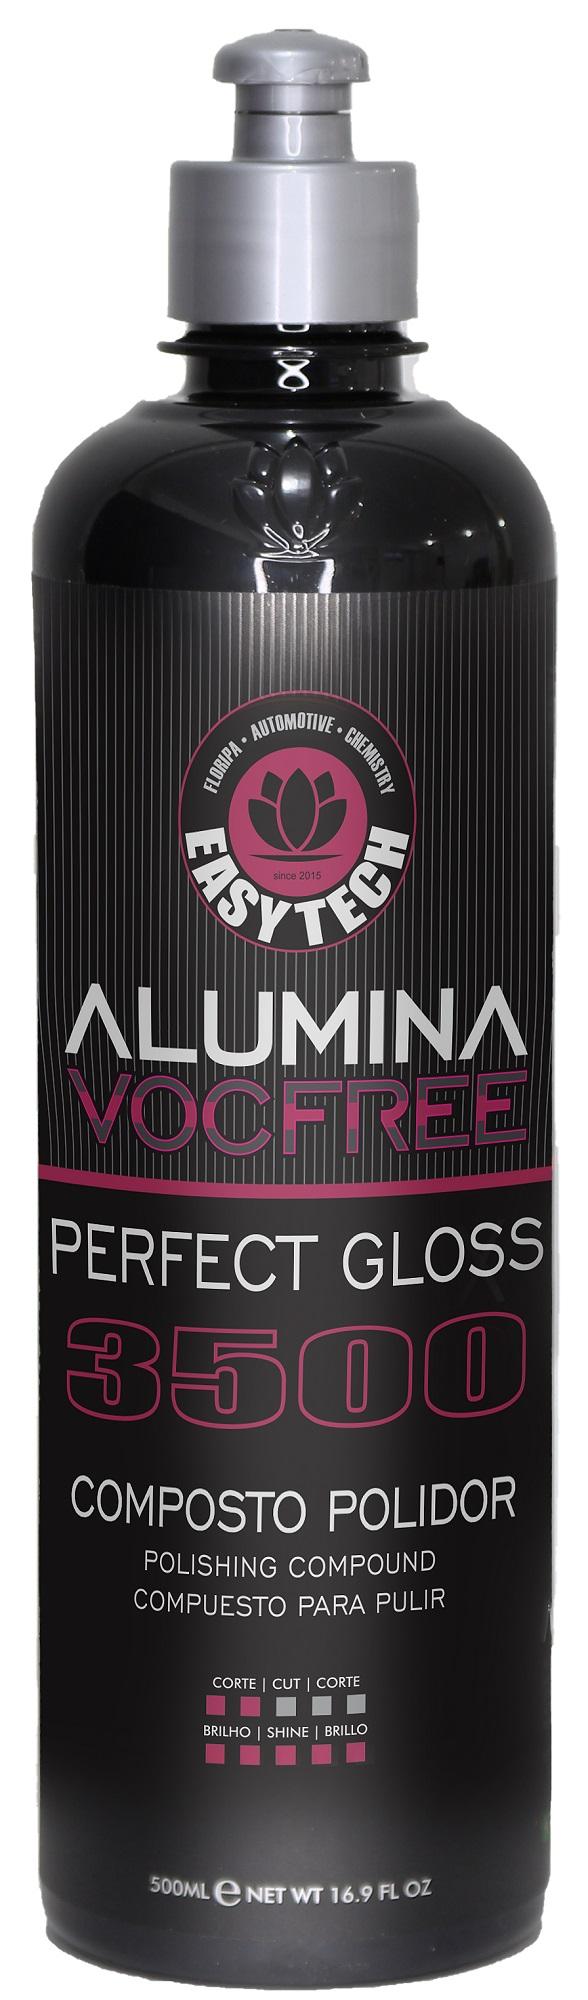 Alumina Perfect Gloss 3500  Composto Polidor de Lustro 500ML